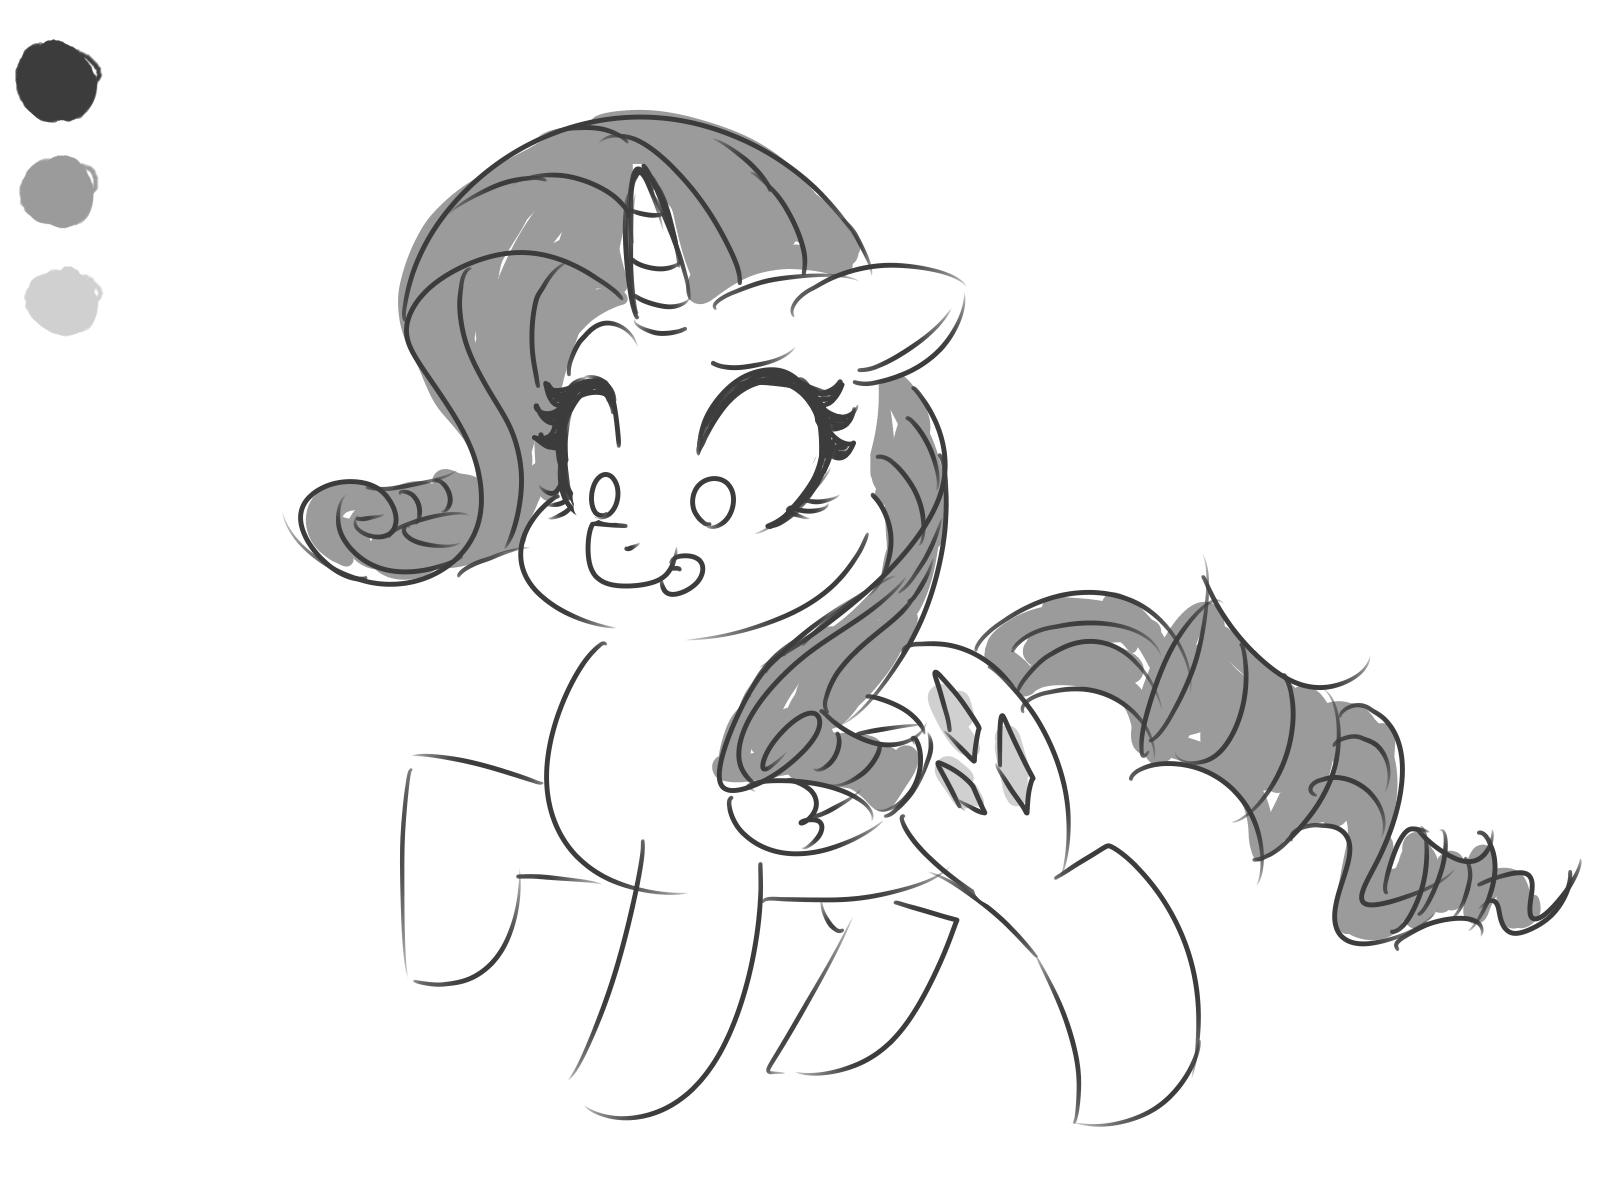 princess rarity princess rarity my little pony coloring page målarbilder princess rarity